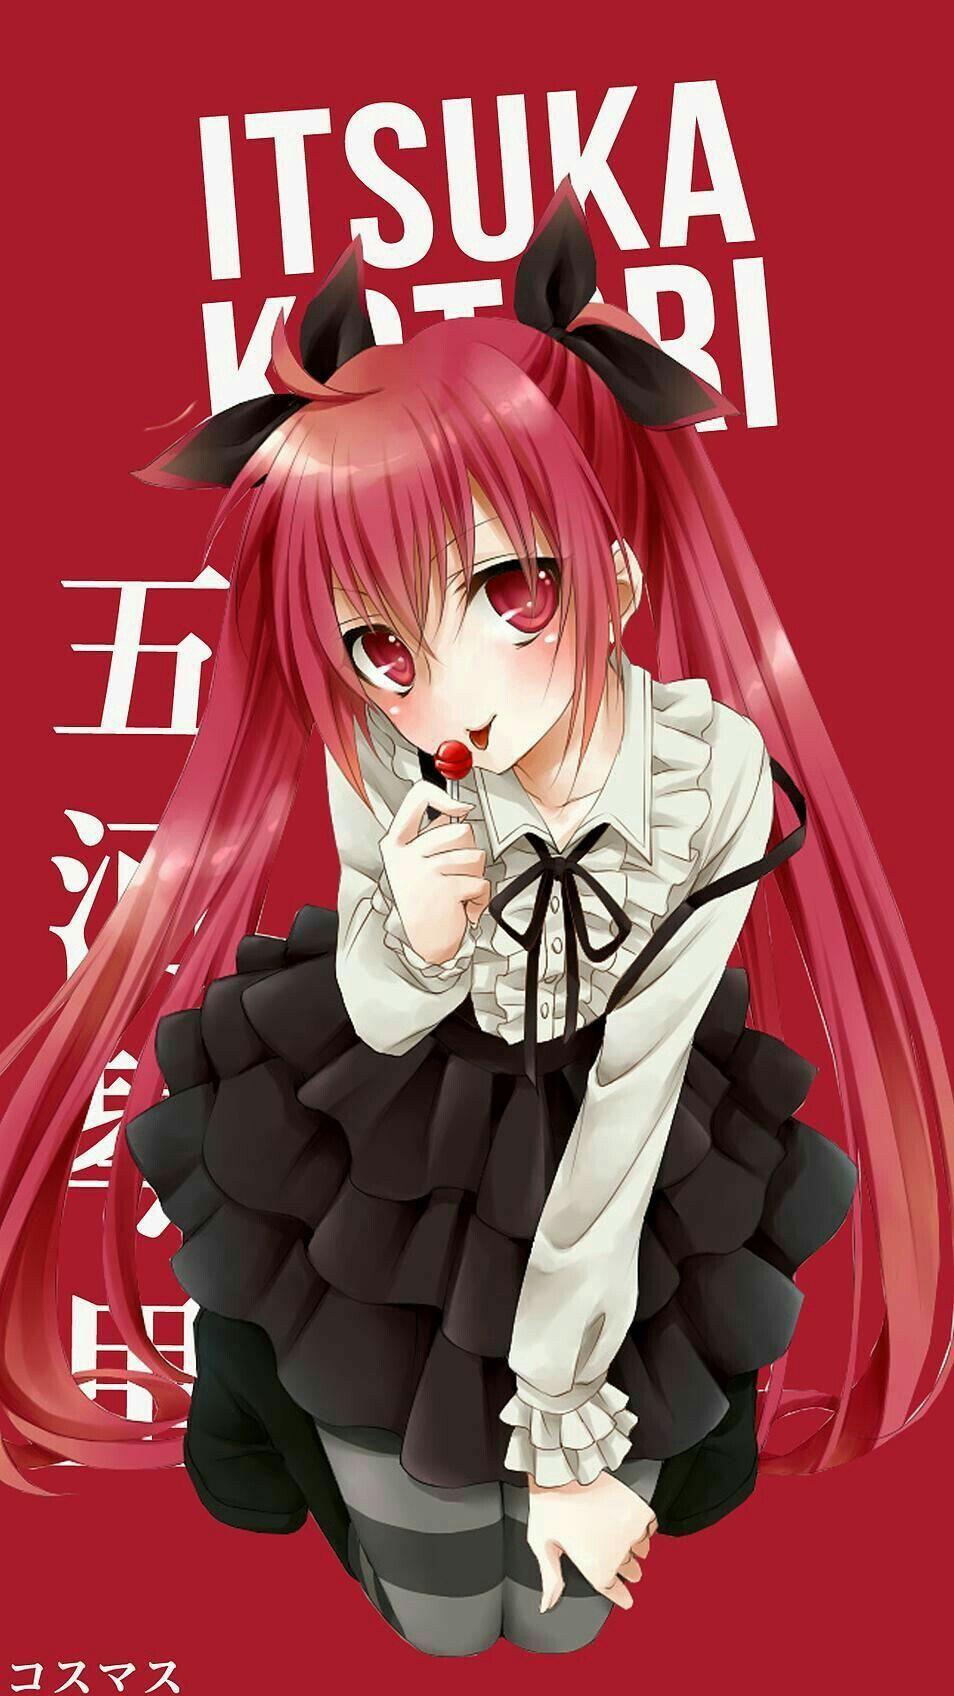 Imágenes Anime | Parte II